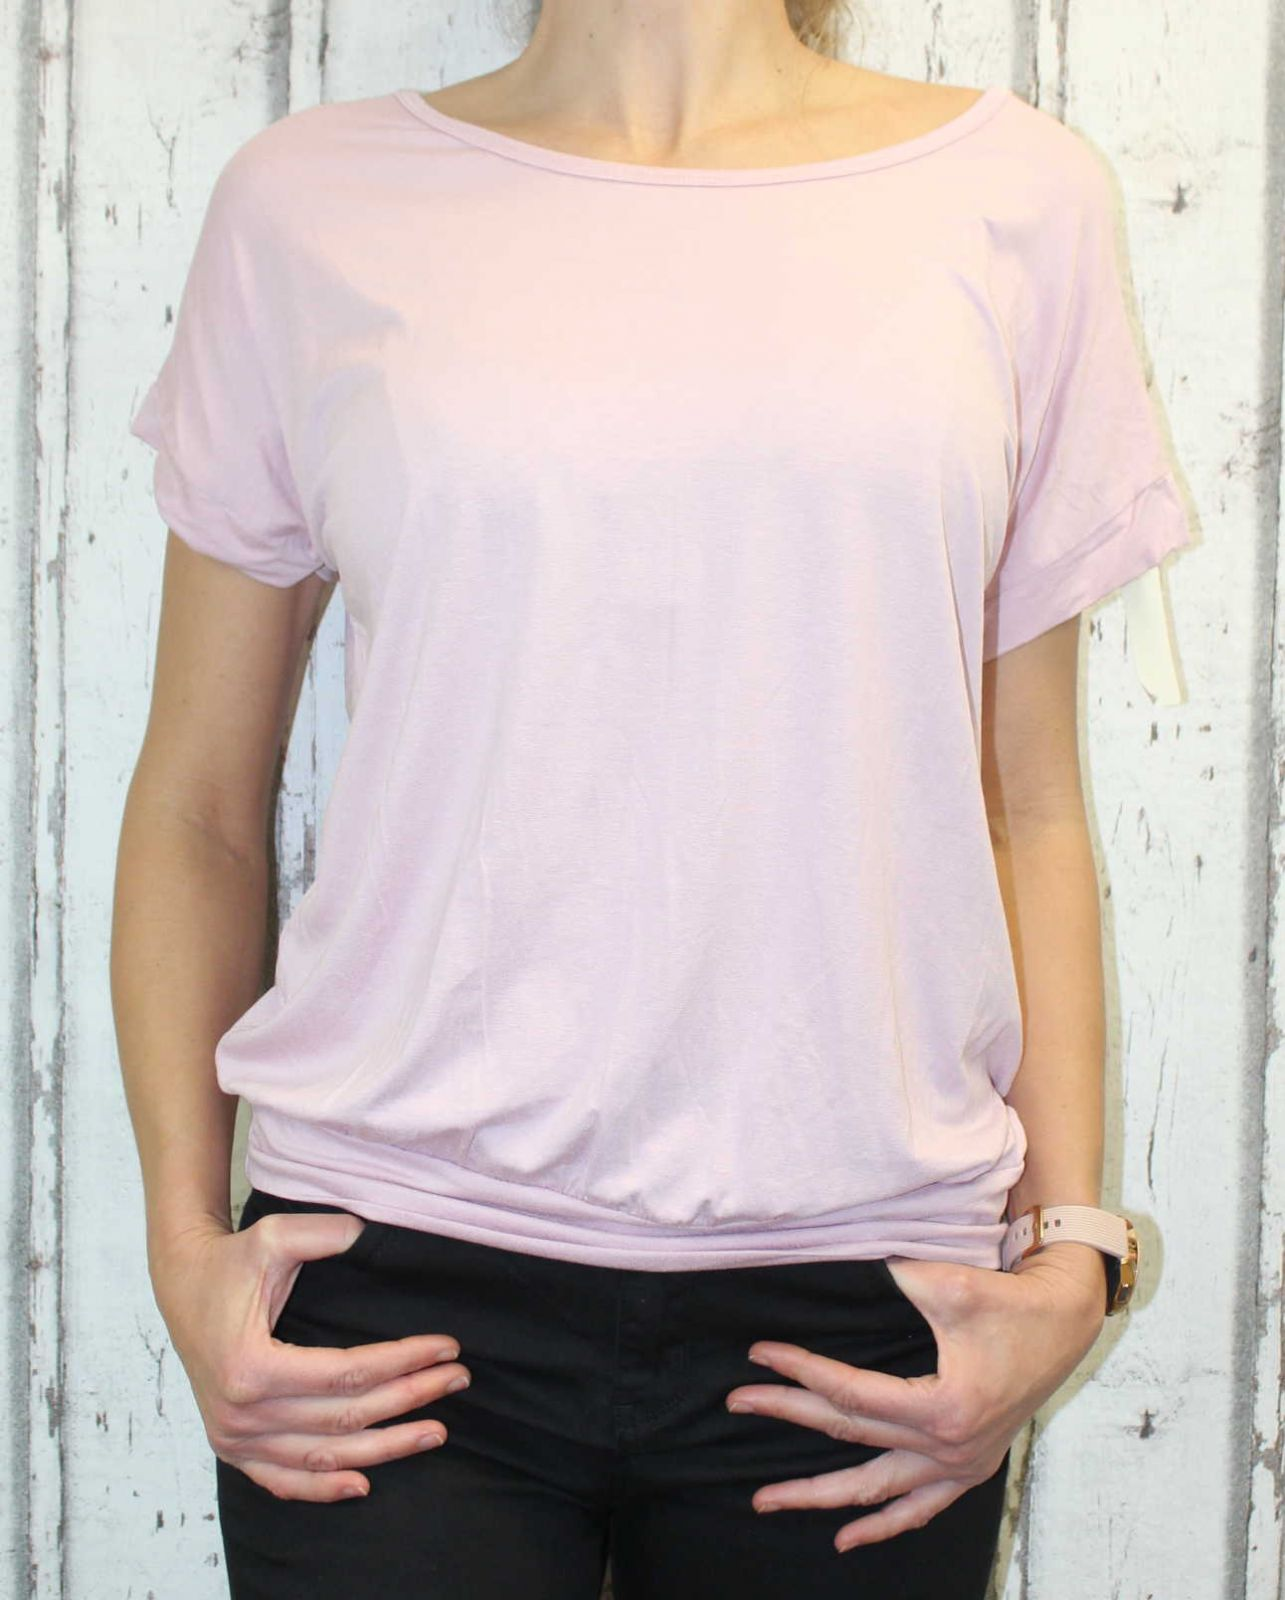 Dámské tričko krátký rukáv, tričko spadlá ramena, dámské volné triko, pohodlné dámské tričko, dámská tunika, tunika s průstřihem na zádech, volné tričko přes břicho, tričko s rantlem, starorůžové volné tričko Italy Moda